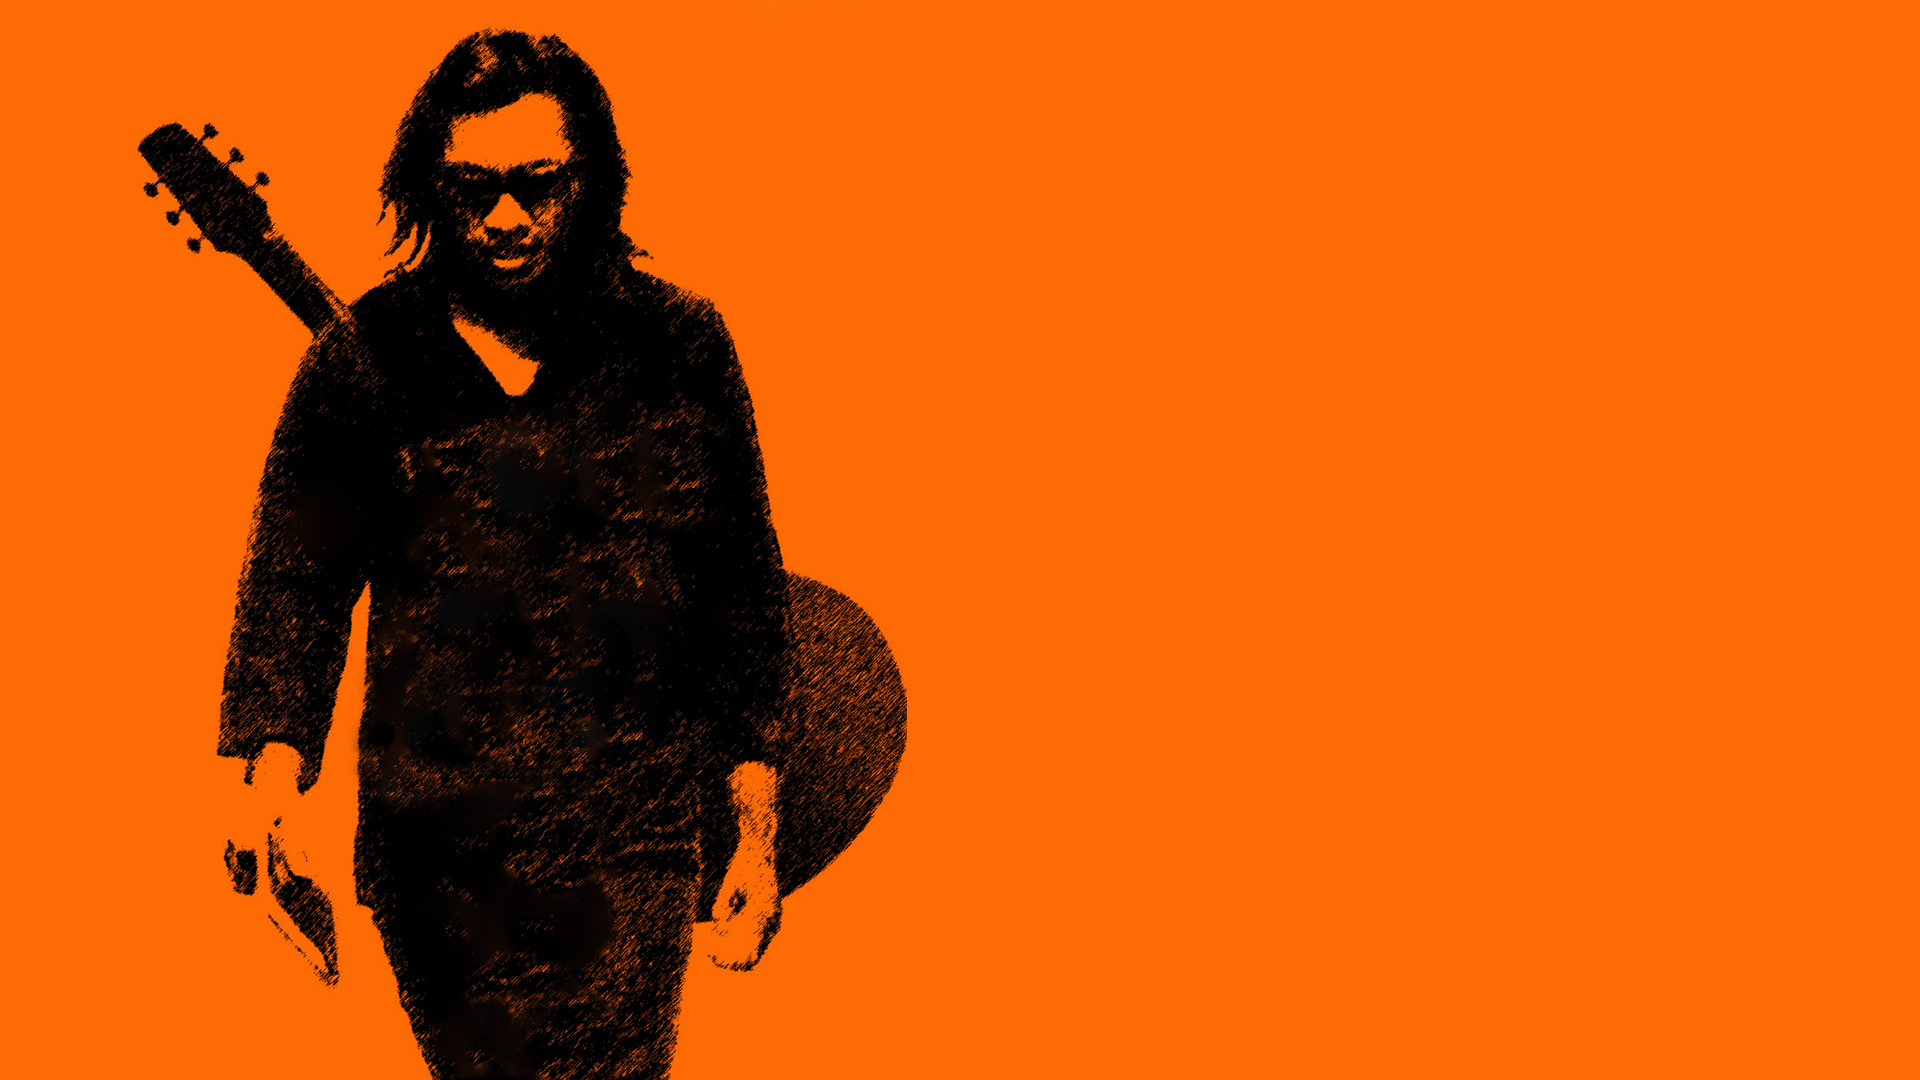 Sixto Rodriguez: Zούσε φτωχός στις ΗΠΑ, αλλά ήταν πιο σταρ κι από τον Elvis στην άλλη μεριά του κόσμου